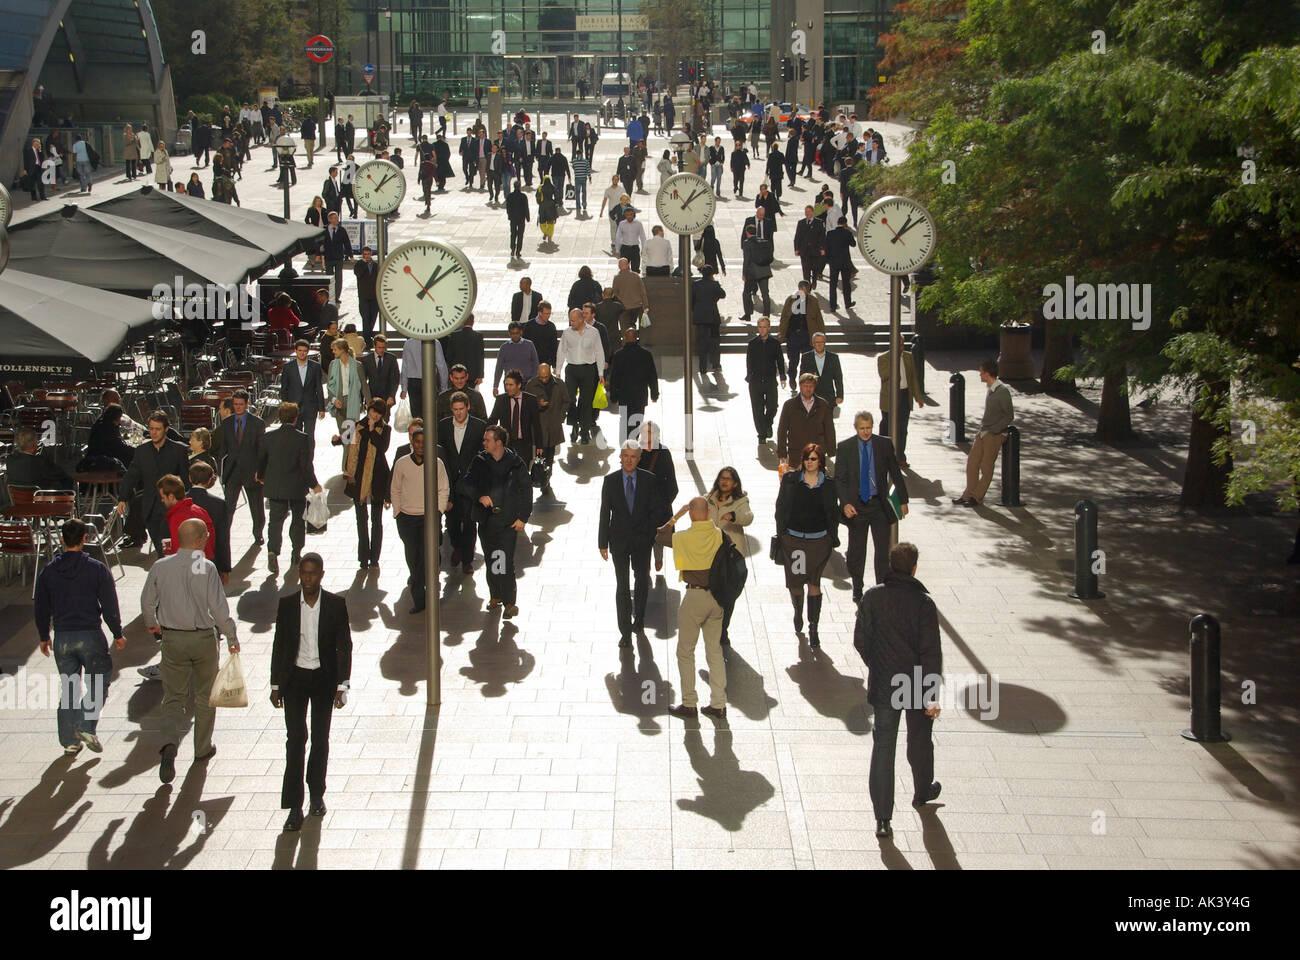 London Docklands Canary Wharf clocks and pavement bar parasols - Stock Image